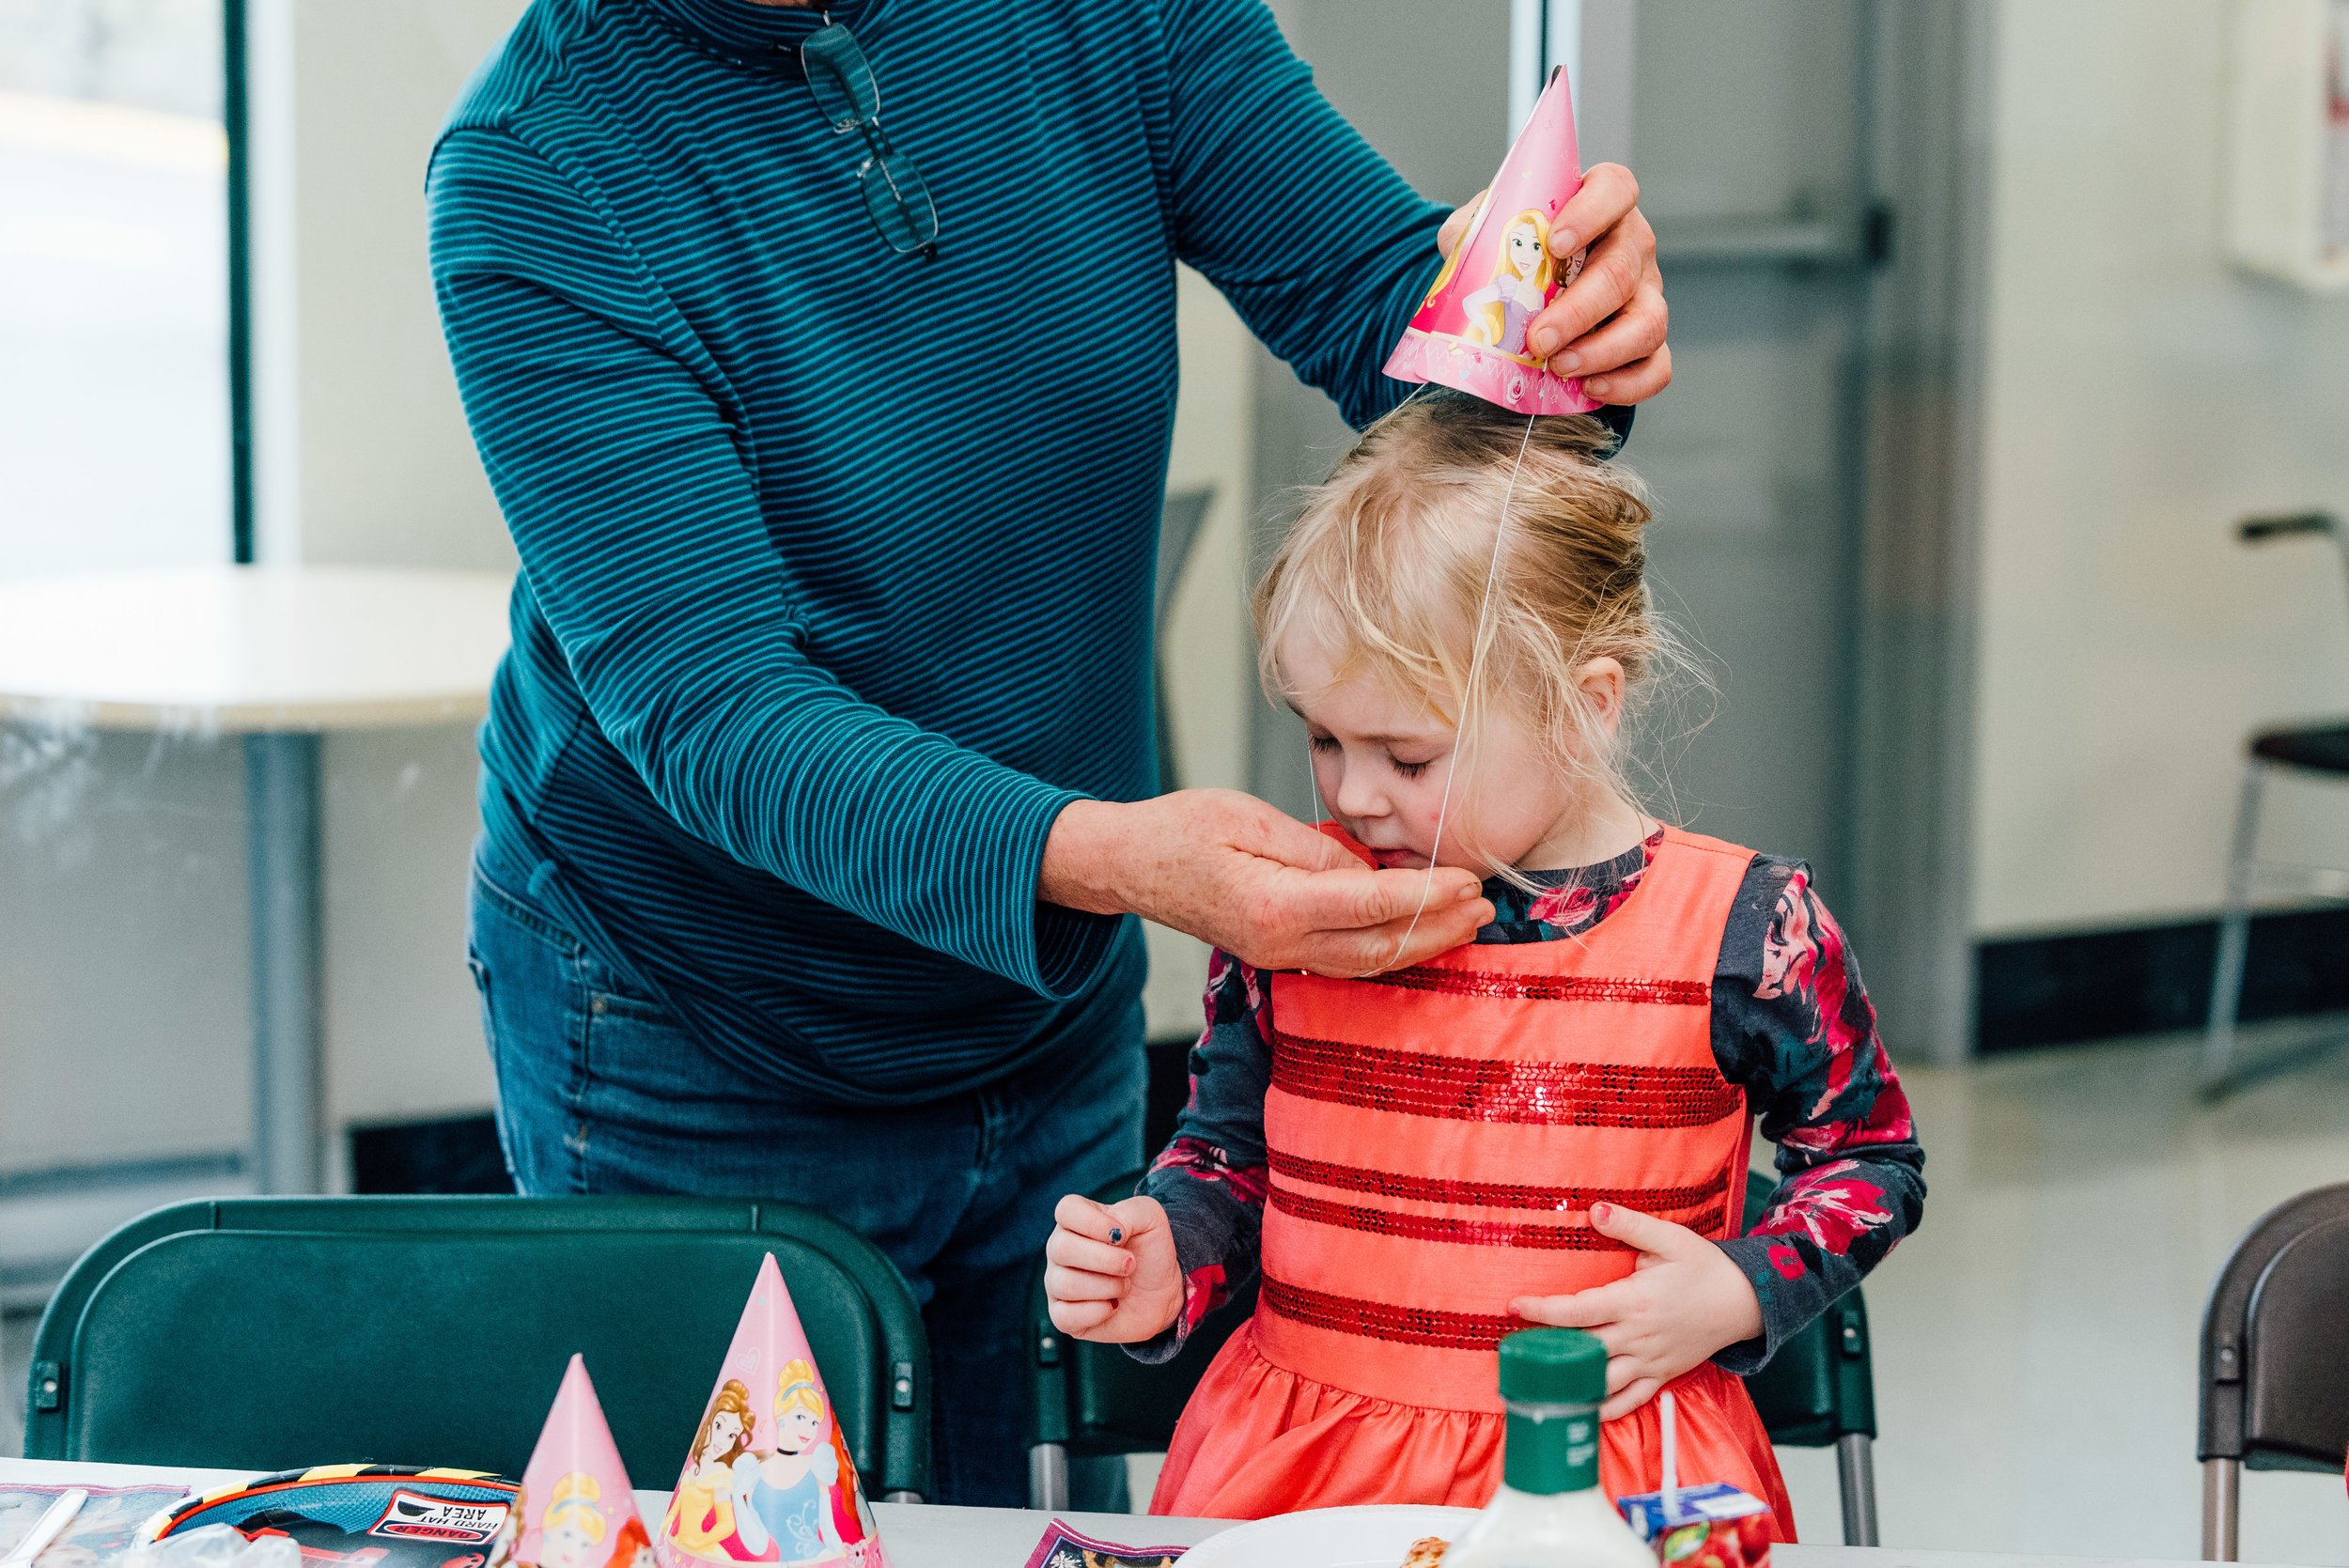 Nicola_Reiersen_Photography_Kids_Birthday_Pool_Party (24).jpg